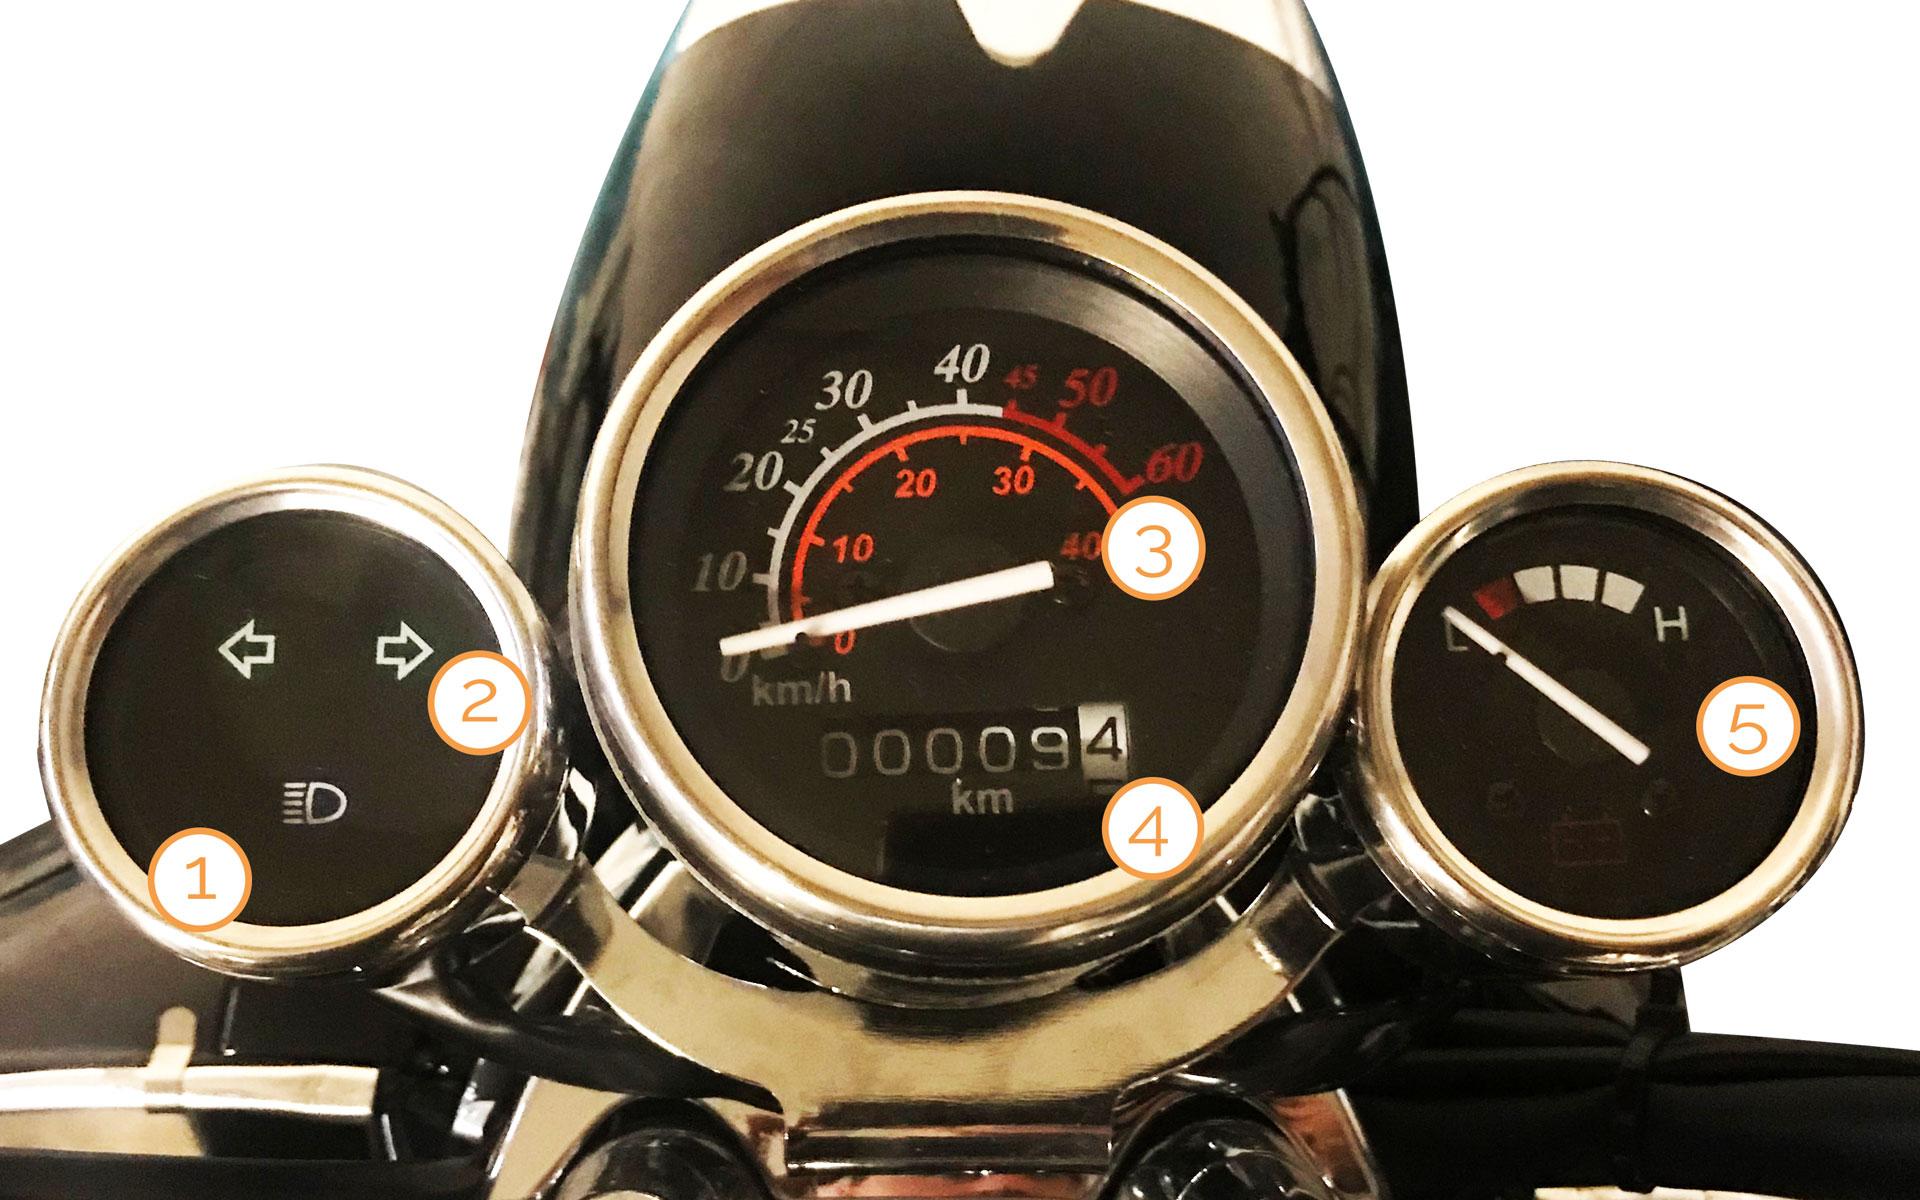 Tacho des eRetro Star Elektro-Motorrollers